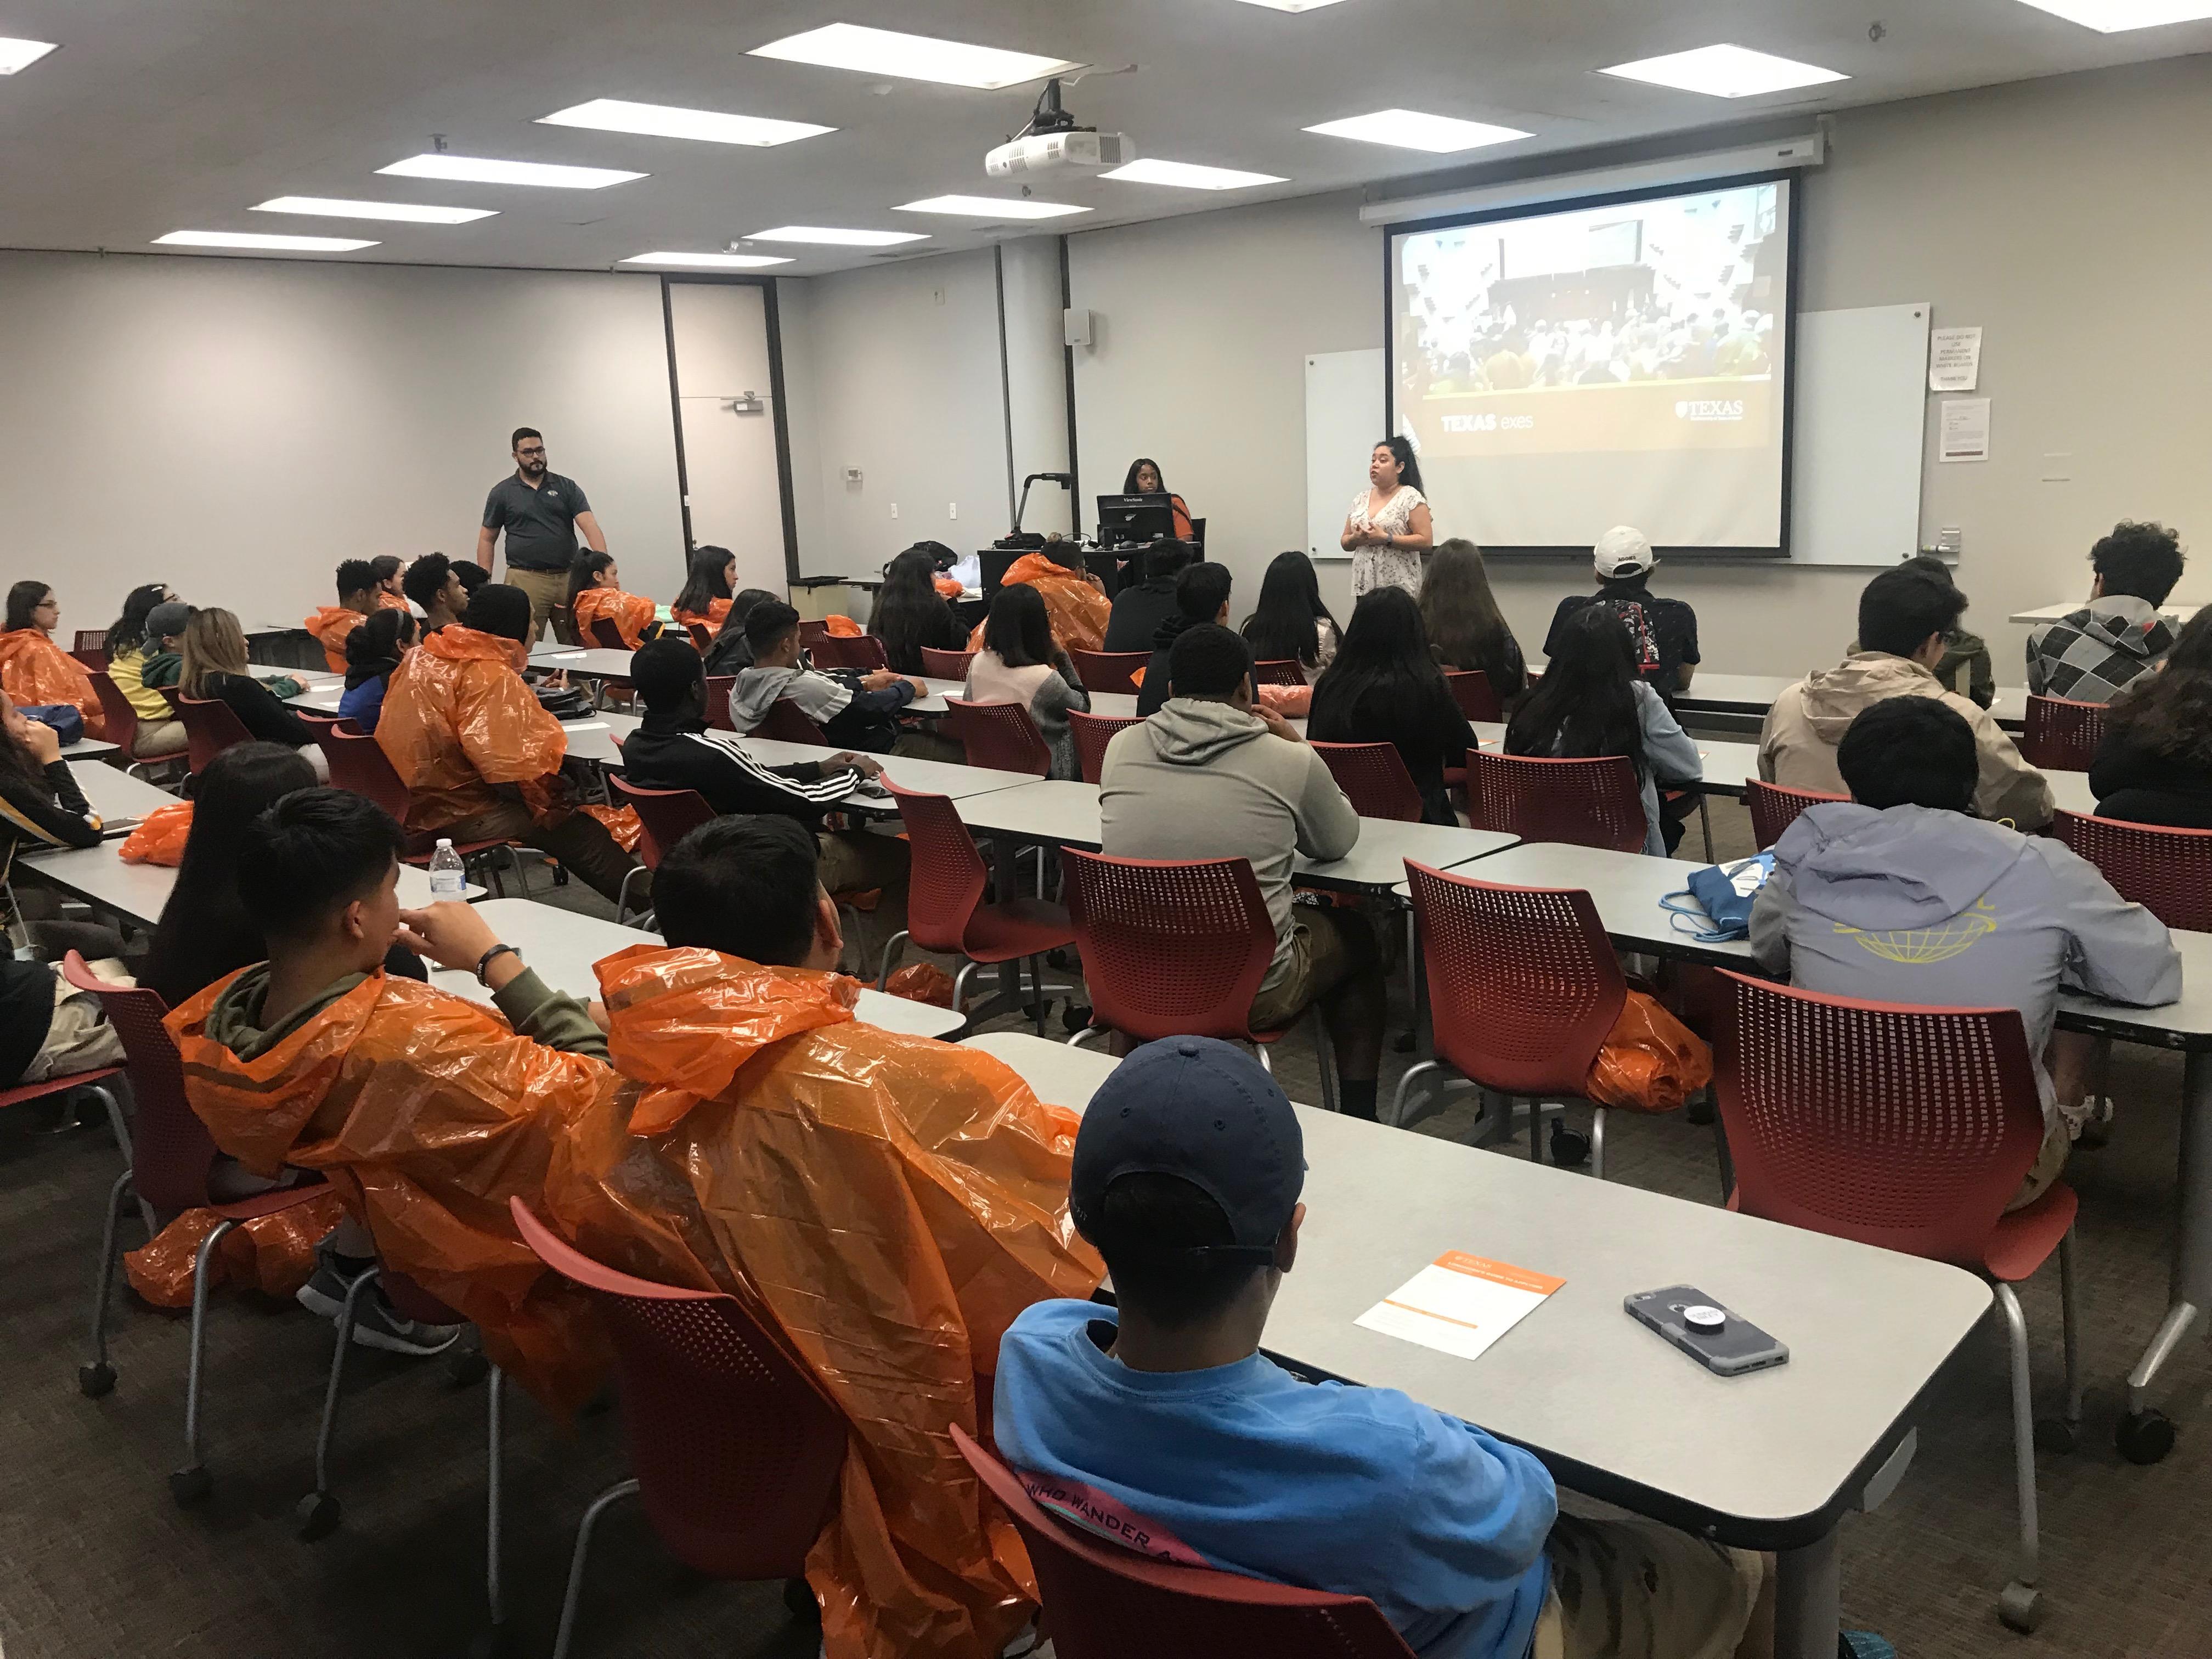 College Readiness / University of Texas